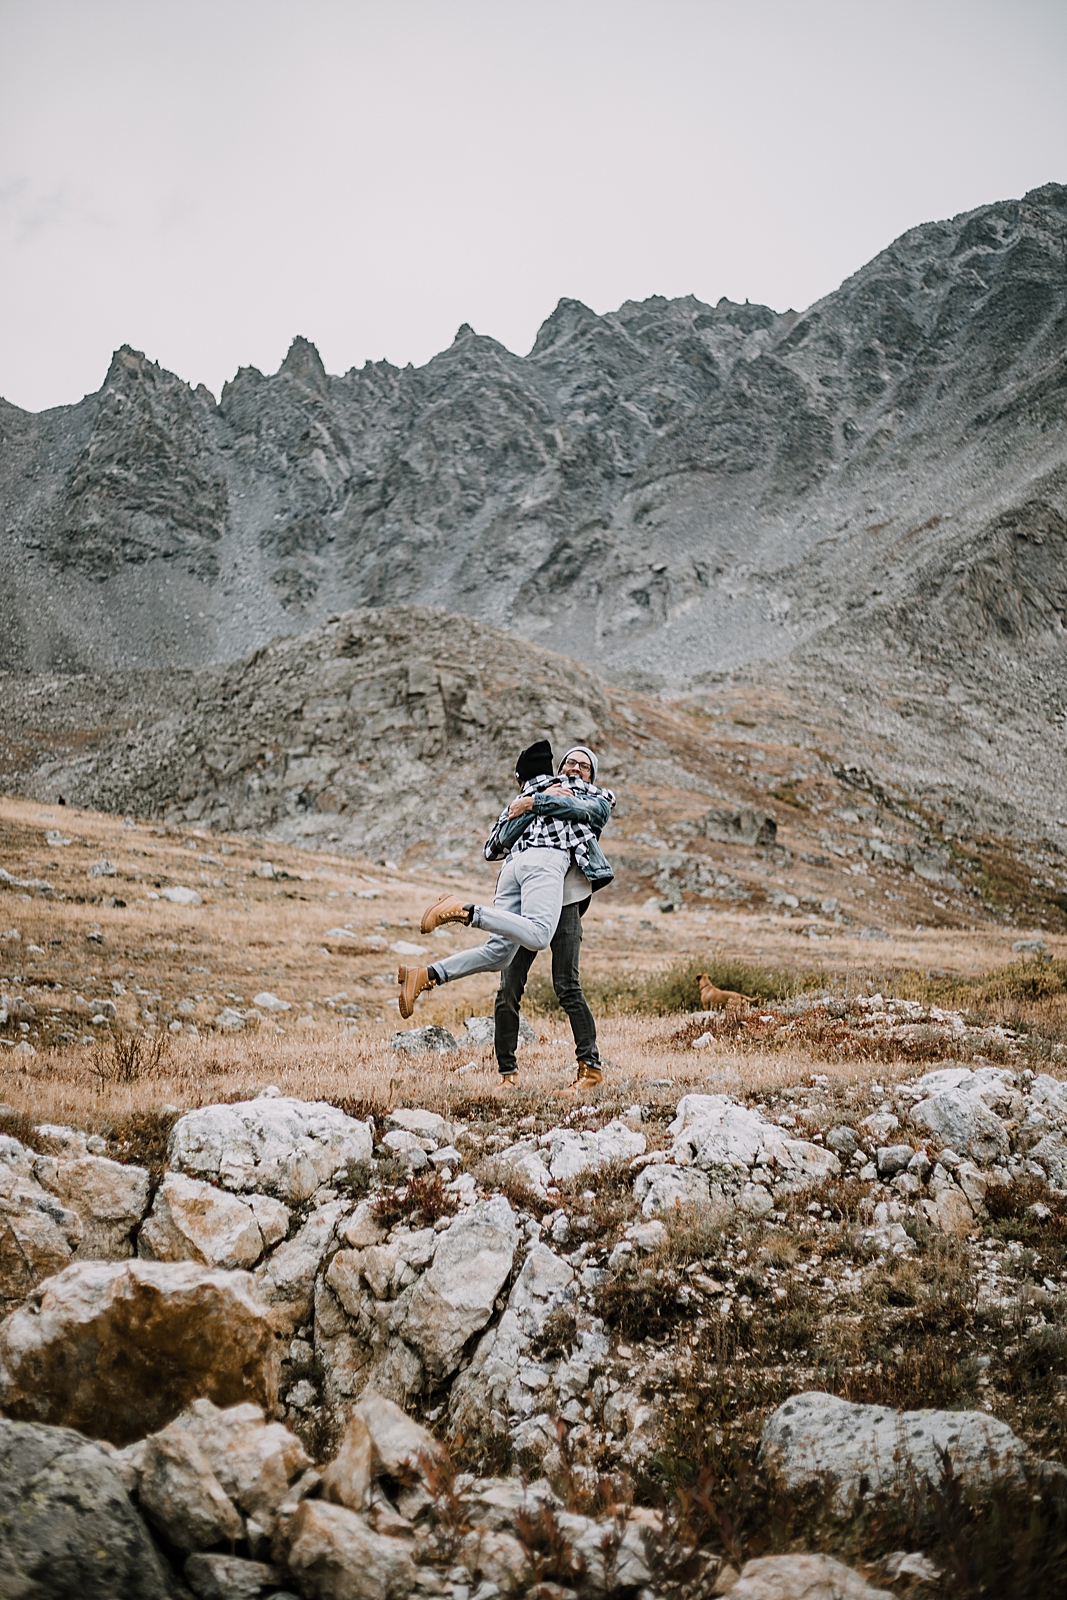 couple spinning, hike mayflower gulch, mayflower gulch proposal, mayflower gulch elopement, mayflower gulch wedding, mayflower gulch engagments, leadville elopement, leadville hiking wedding